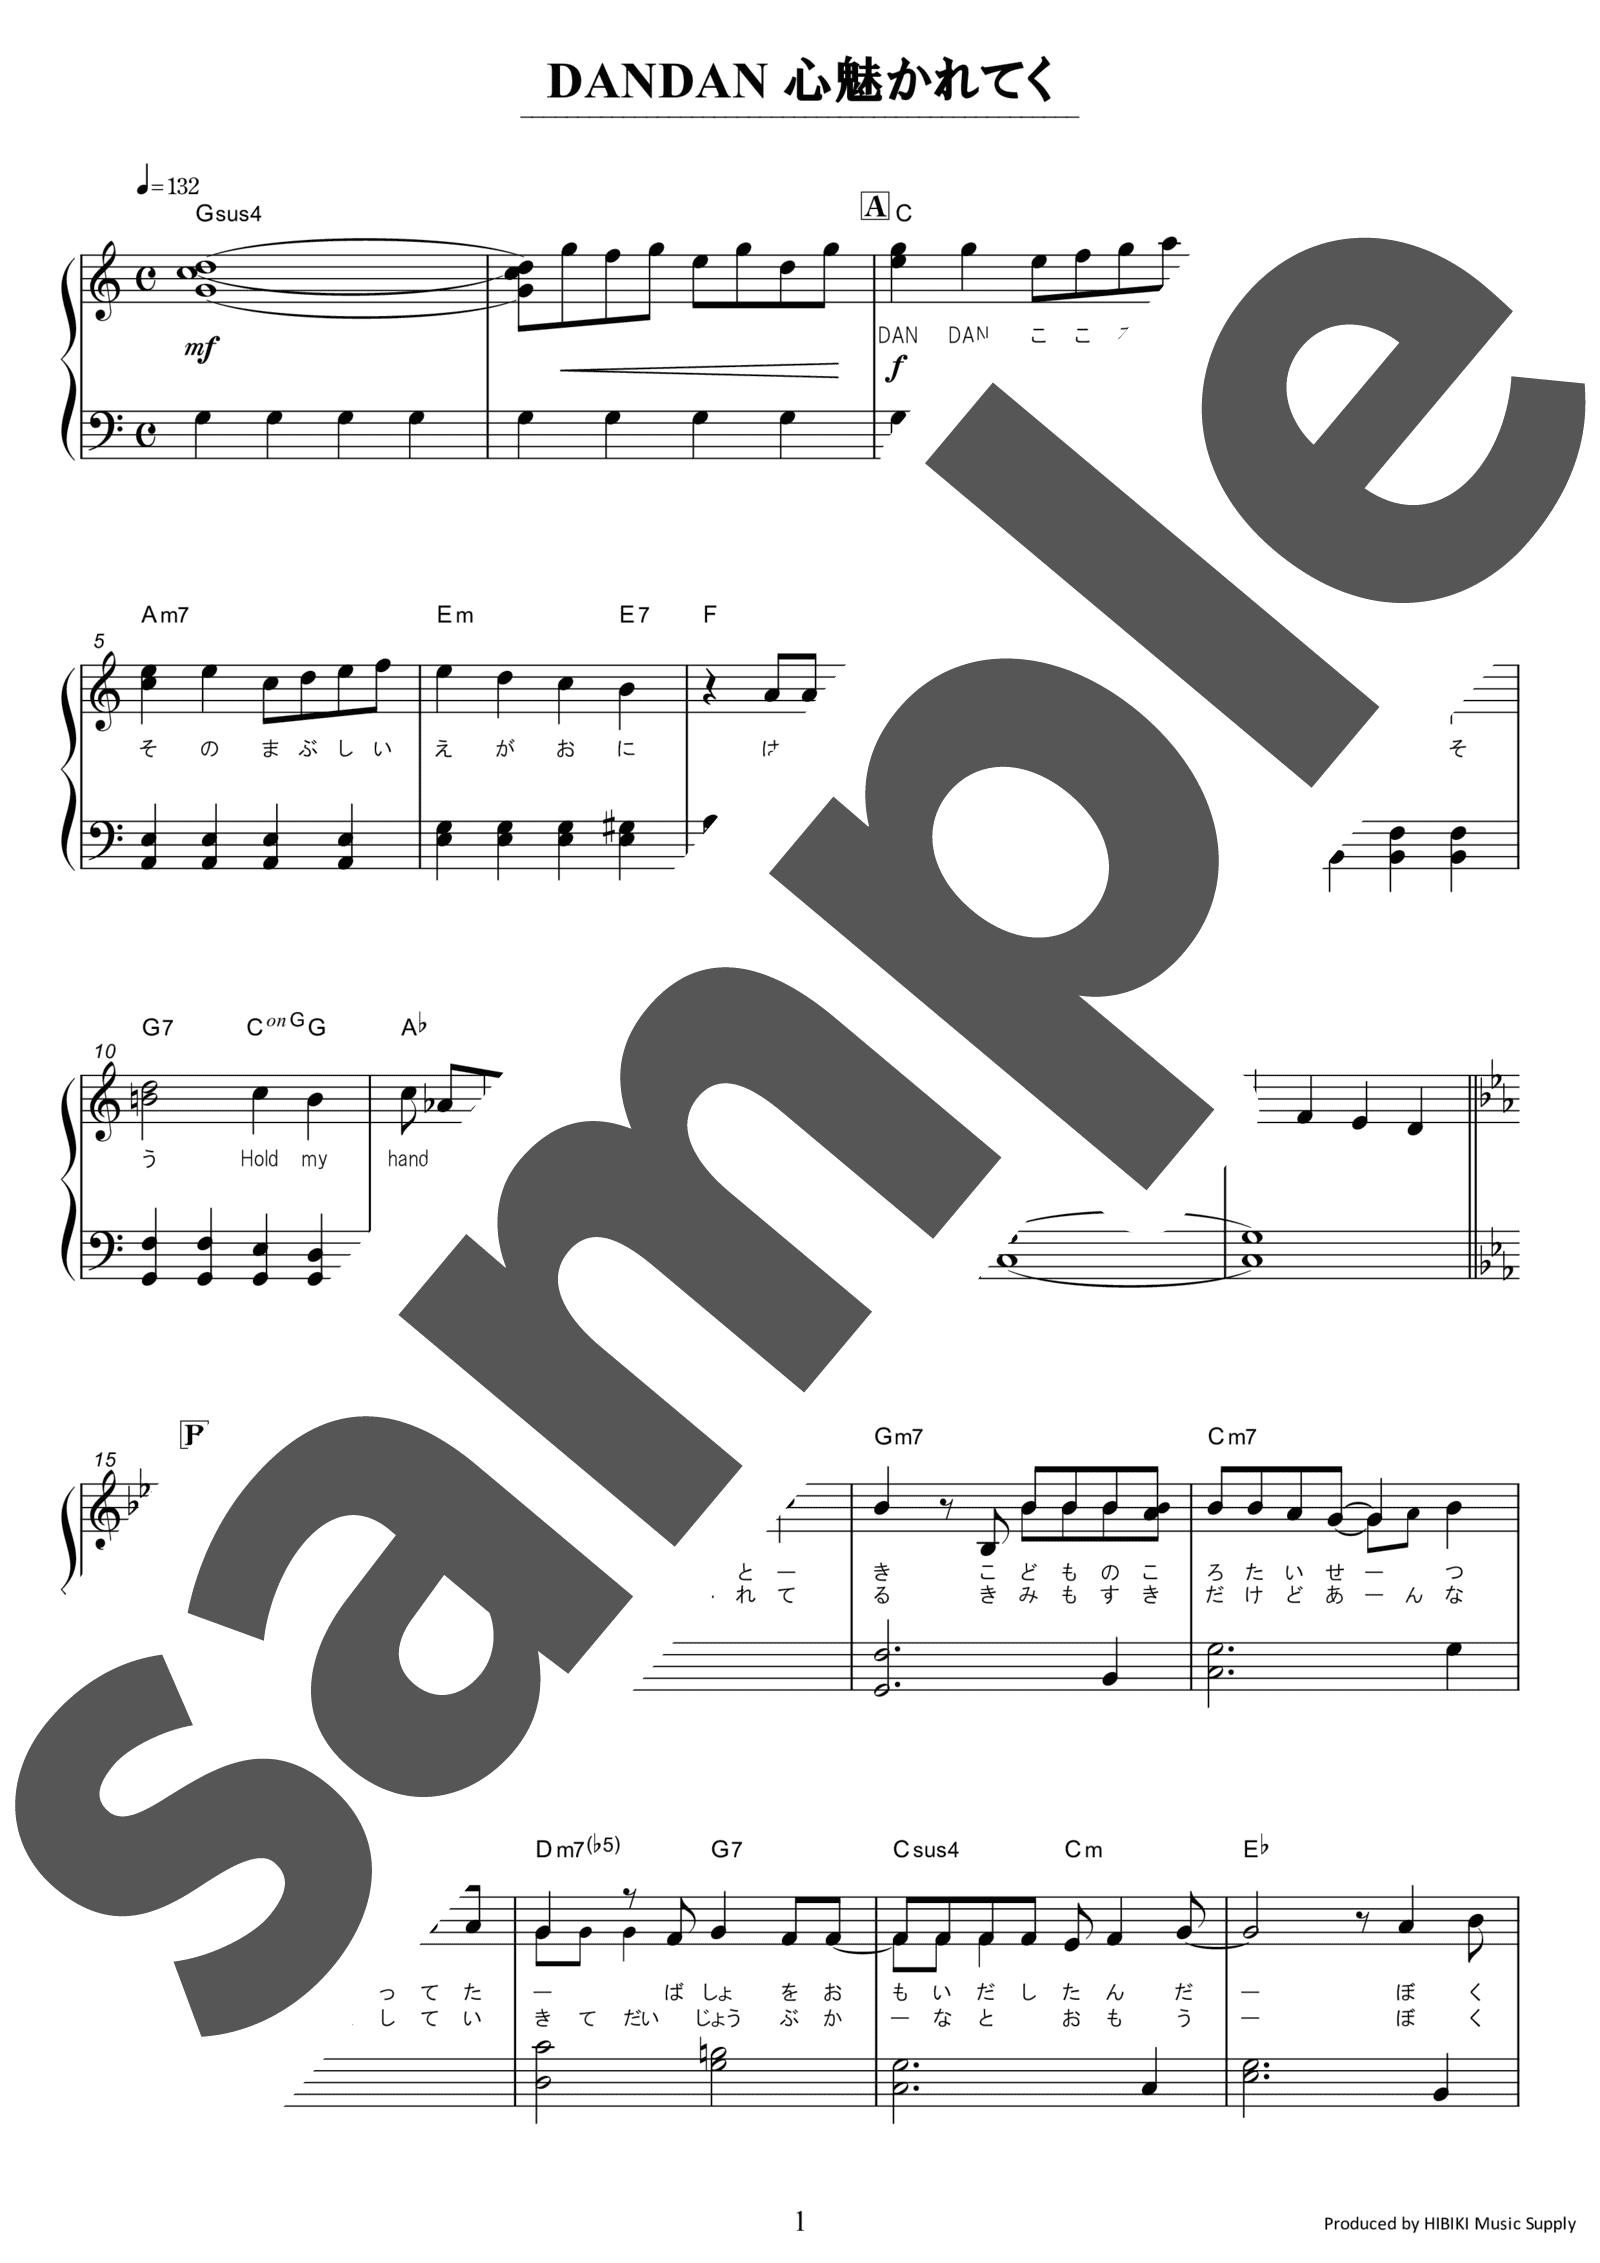 「DANDAN心魅かれてく」のサンプル楽譜